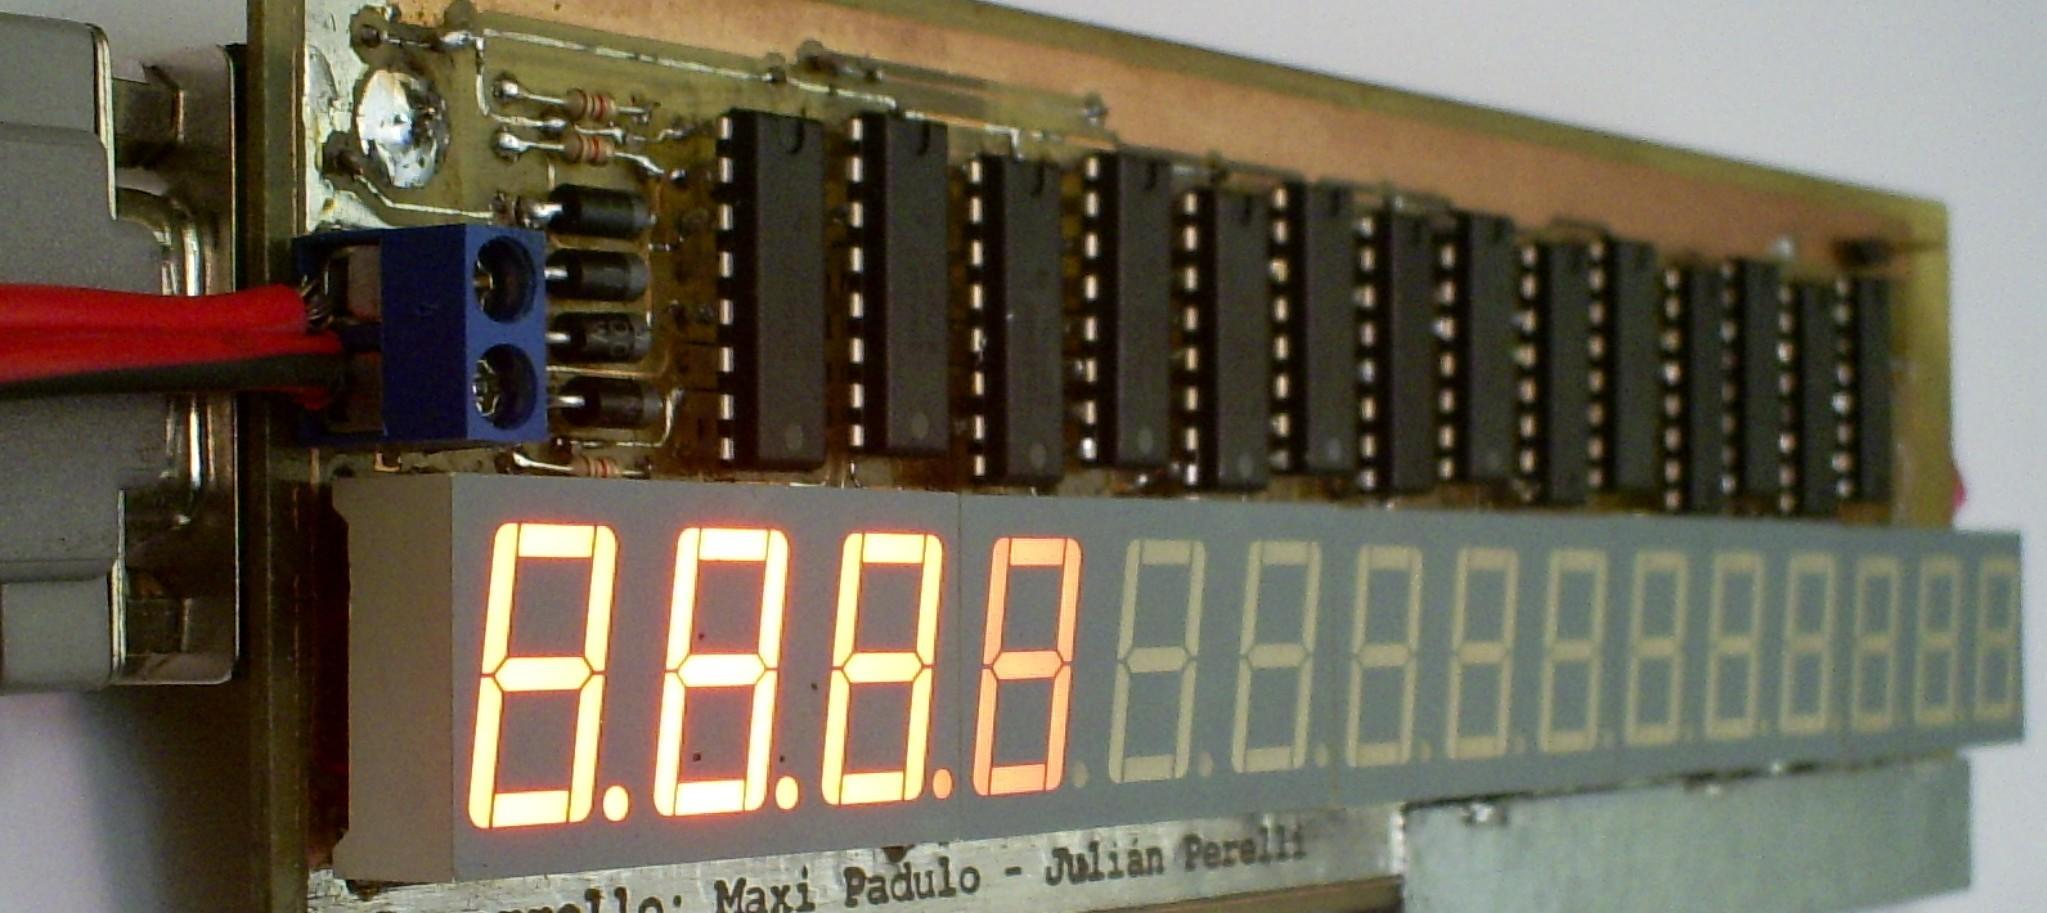 15 Digit 7 Segment Display The 4digit 7segment Led Driver Circuit We Will Build Using A